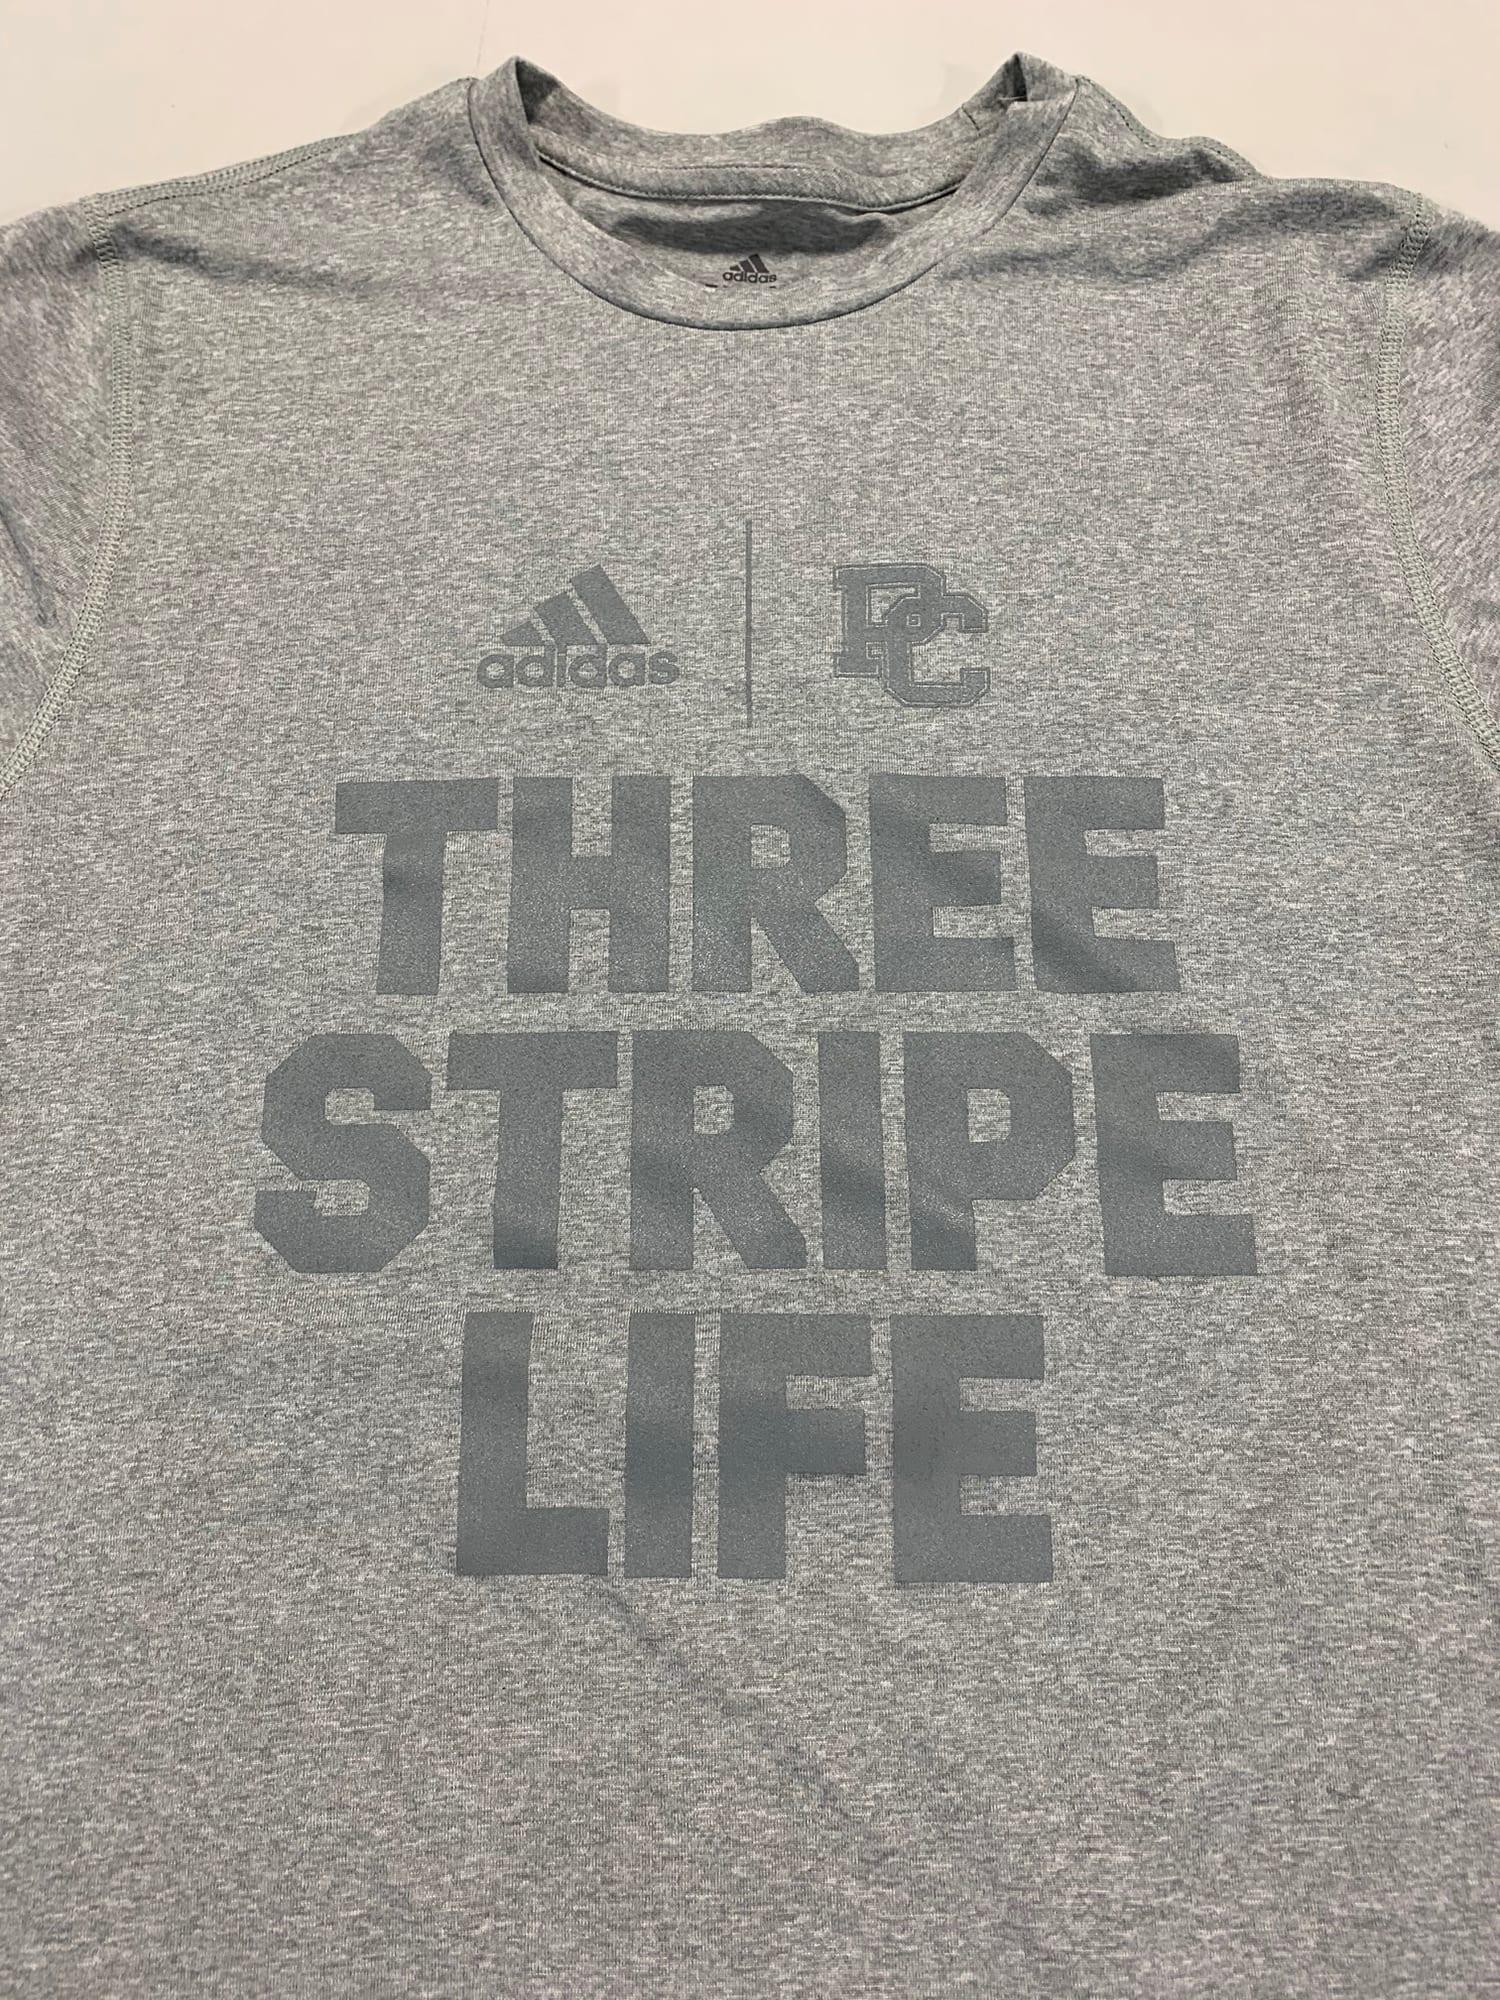 Adidas 3stripelife Sp Example